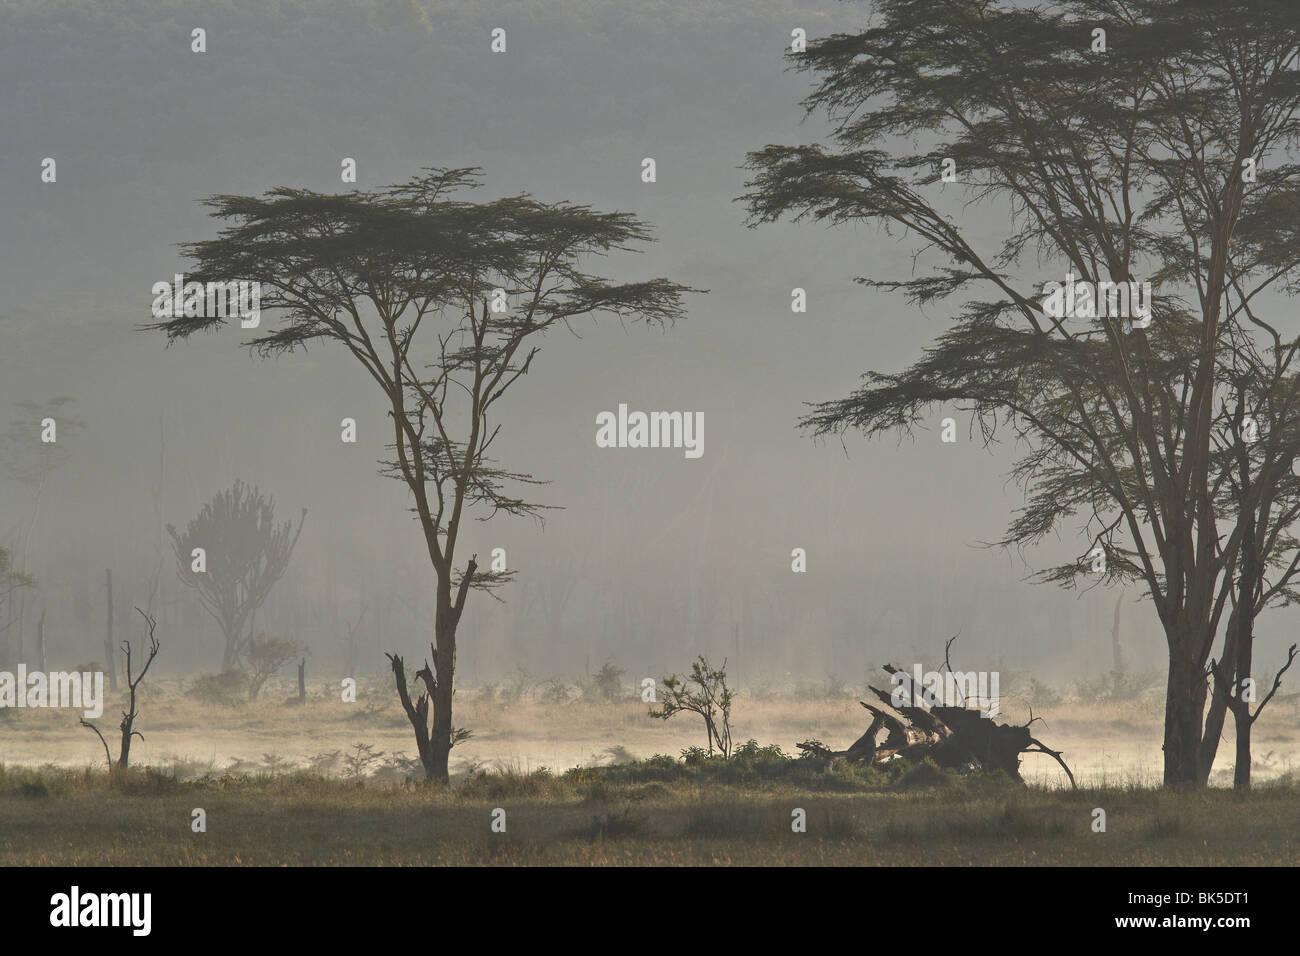 Acacia e euphorbia alberi, Lake Nakuru National Park, Kenya, Africa orientale, Africa Immagini Stock